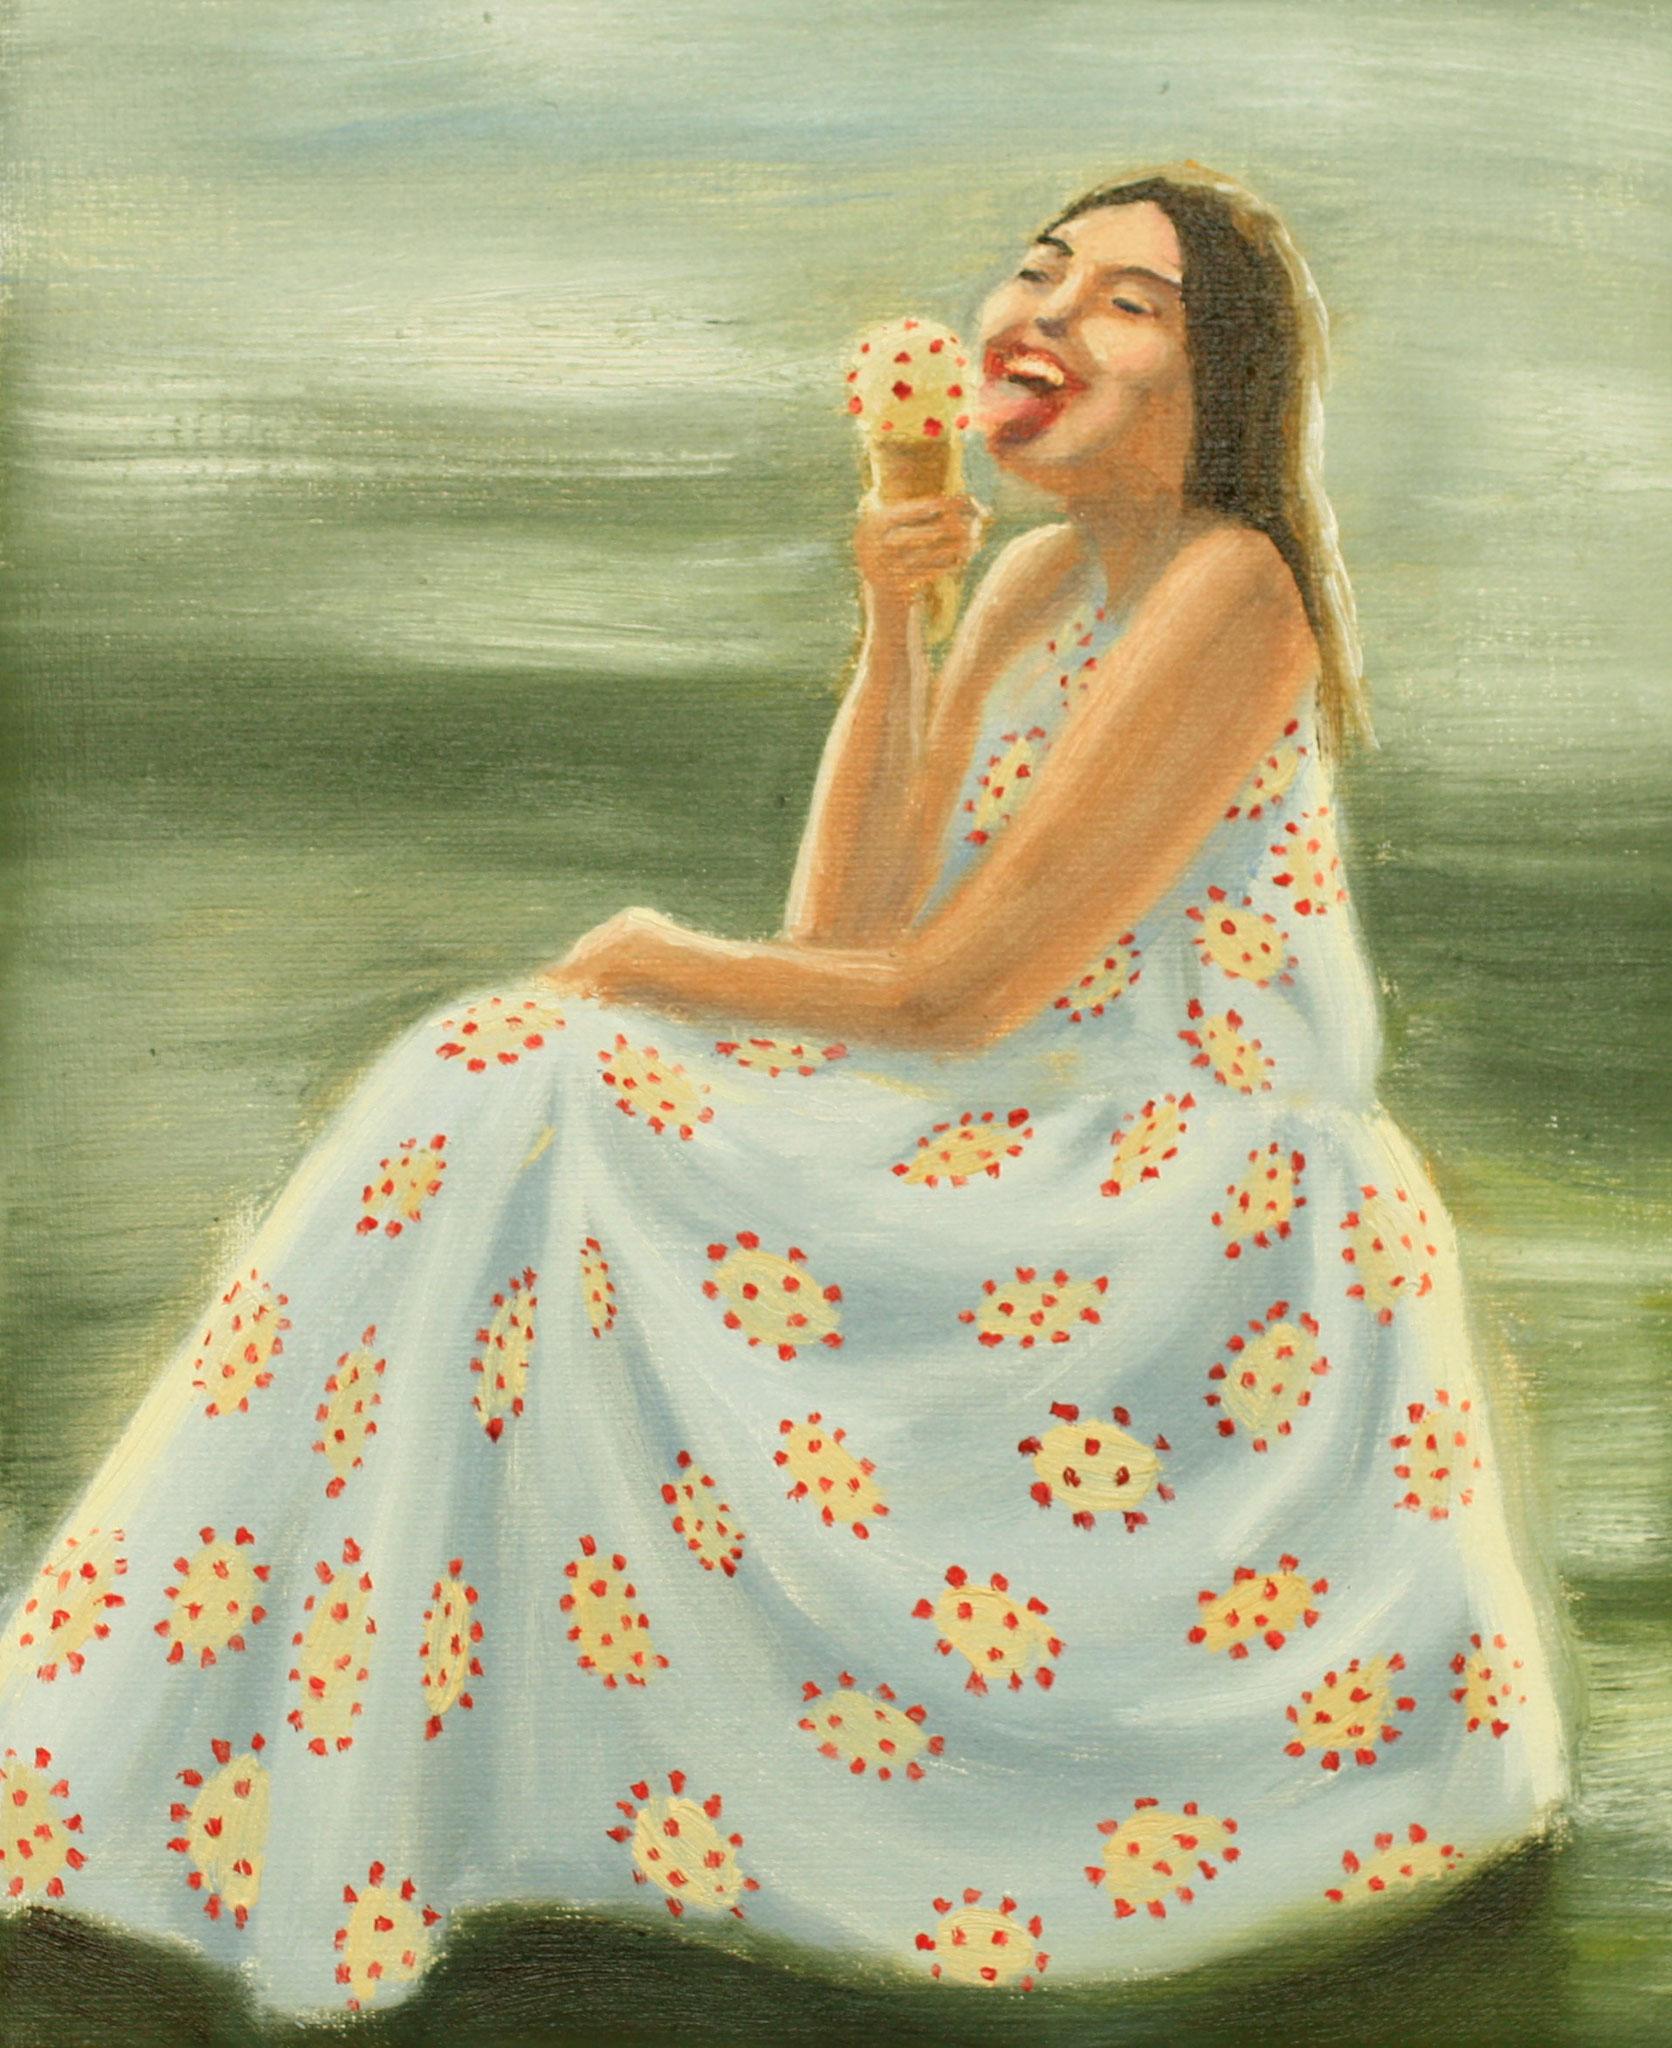 Summer dress with corona